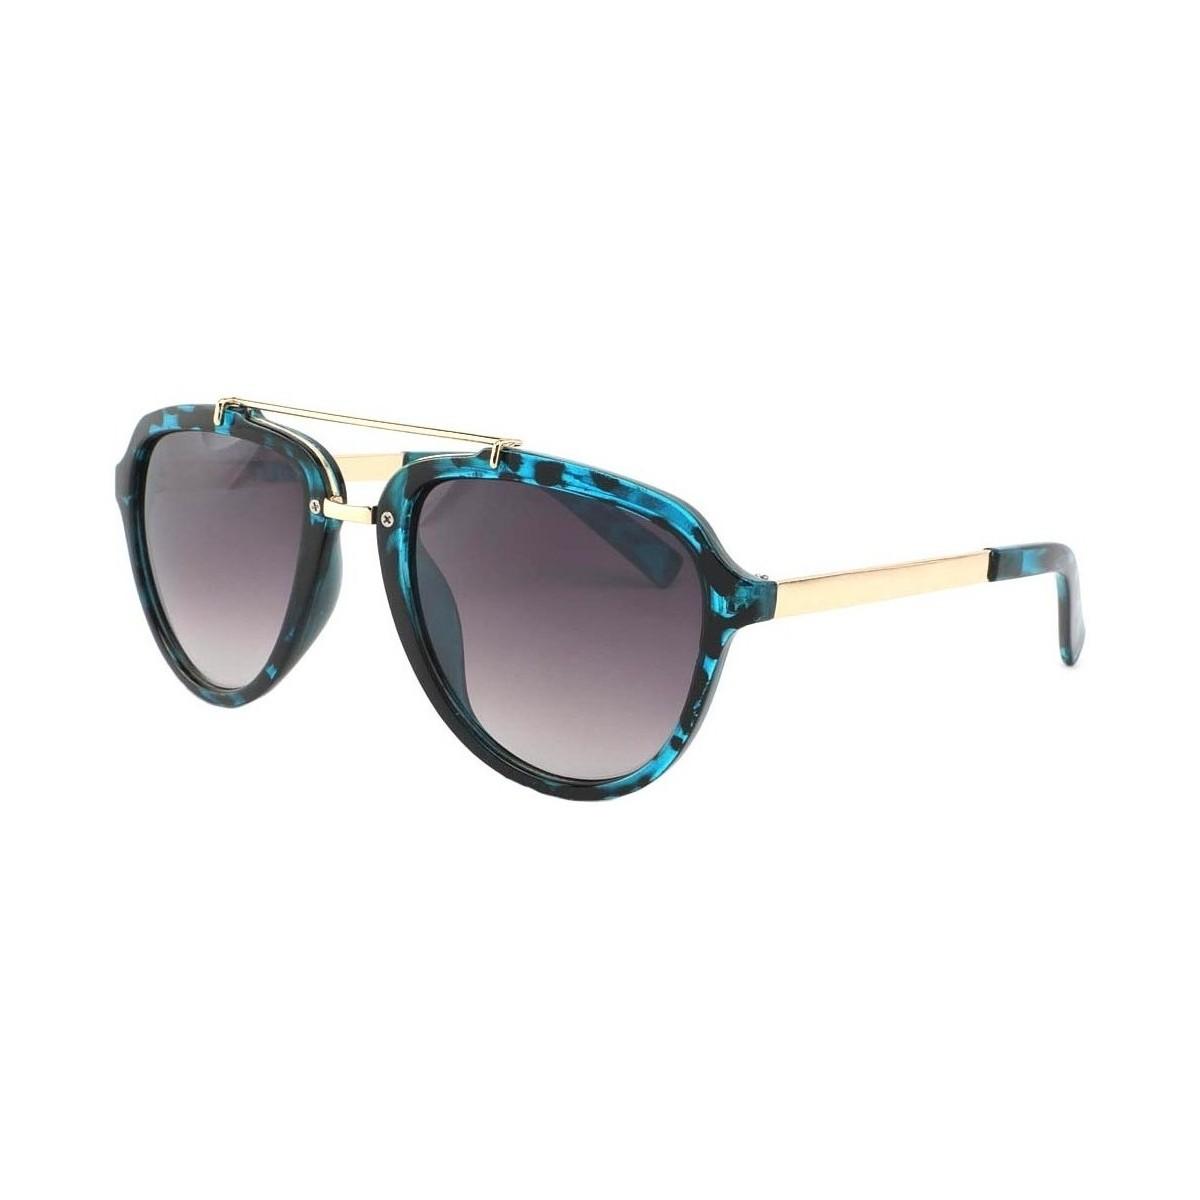 Eye Wear Lunettes de soleil Aviateur Bleu Ponza Bleu